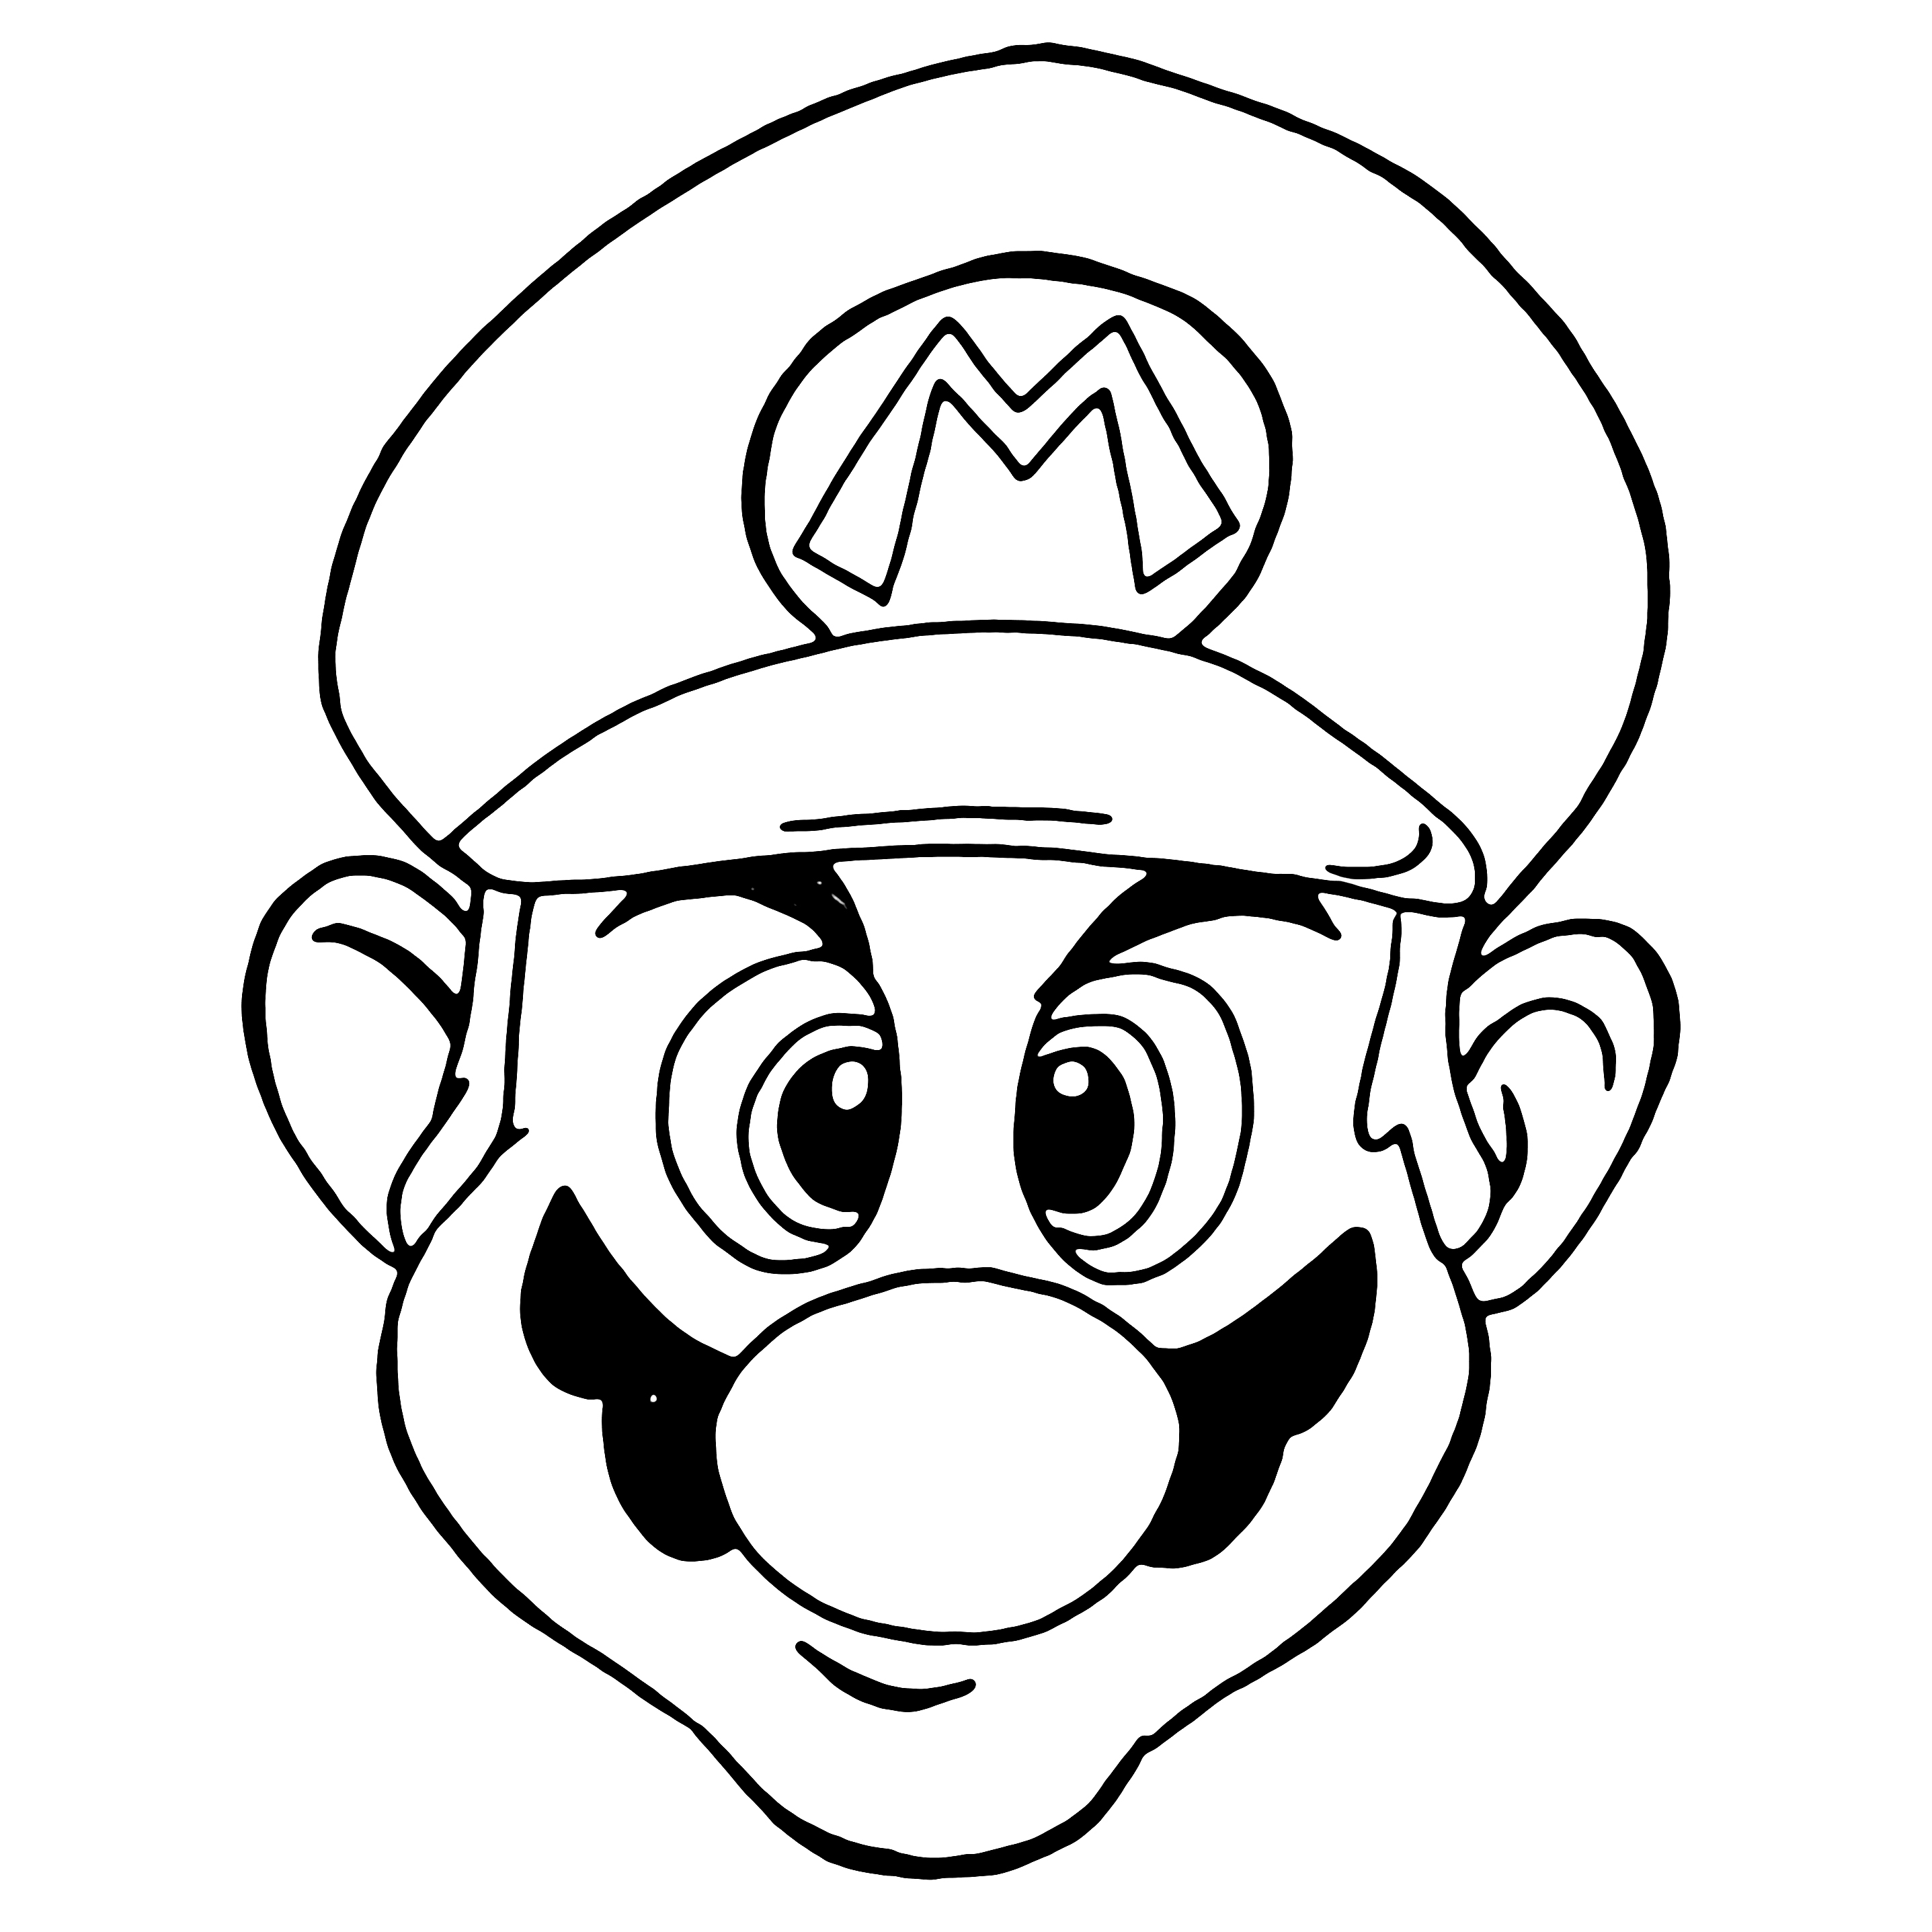 Super Mario 3d World Symbol